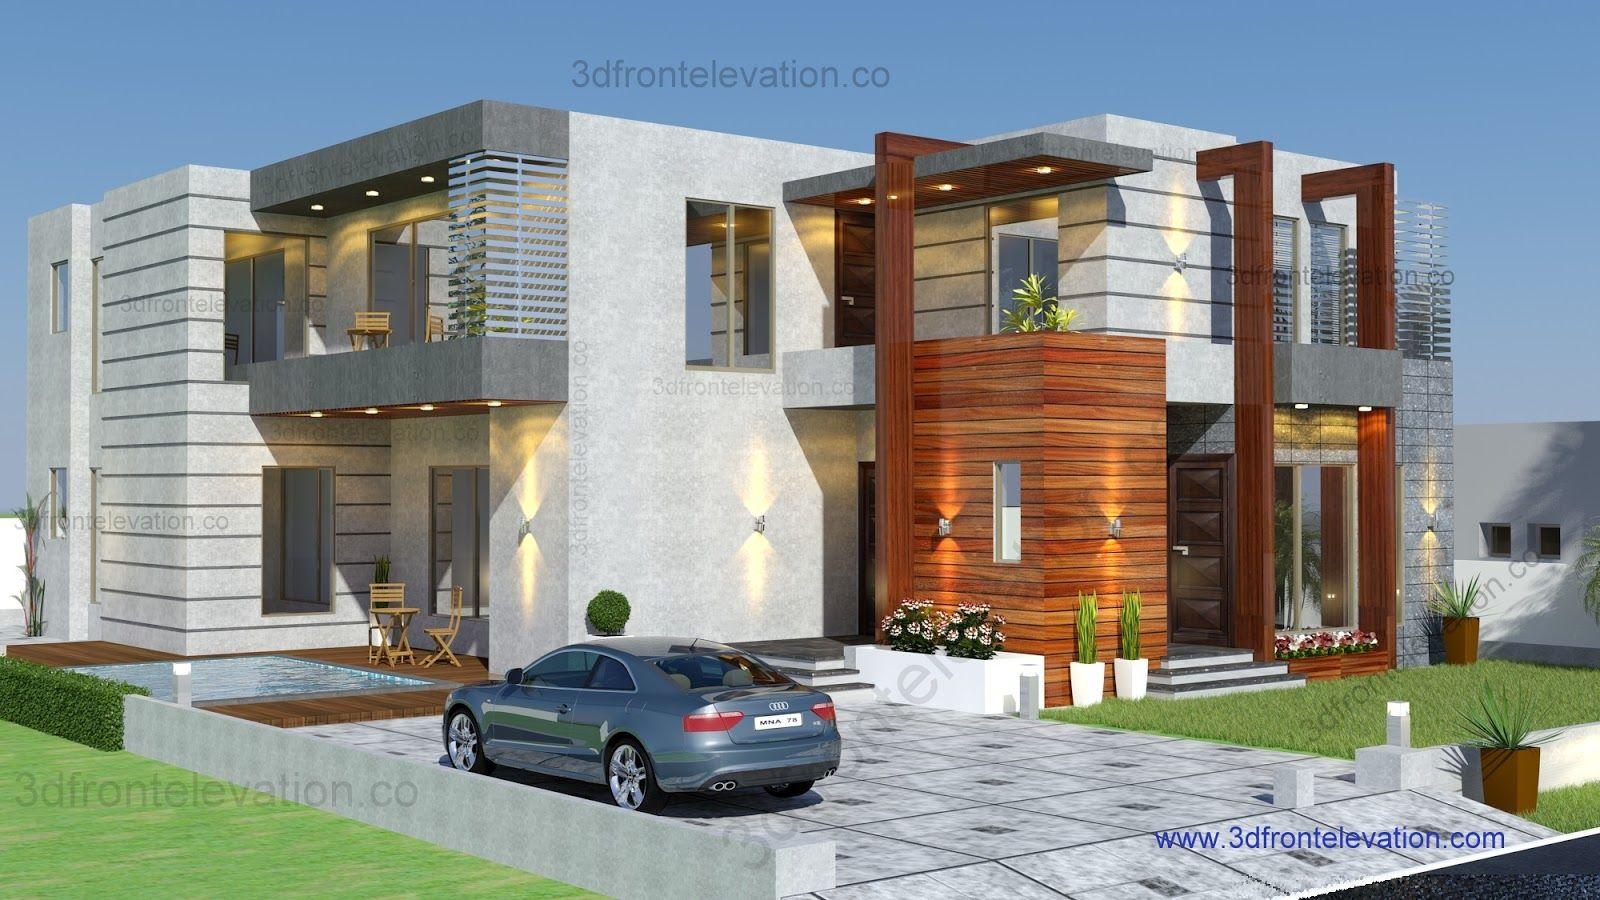 Pakistan modern home designs modern desert homes - Contemporary Modern Villa Commercial European Maps Bungalow Design Interior